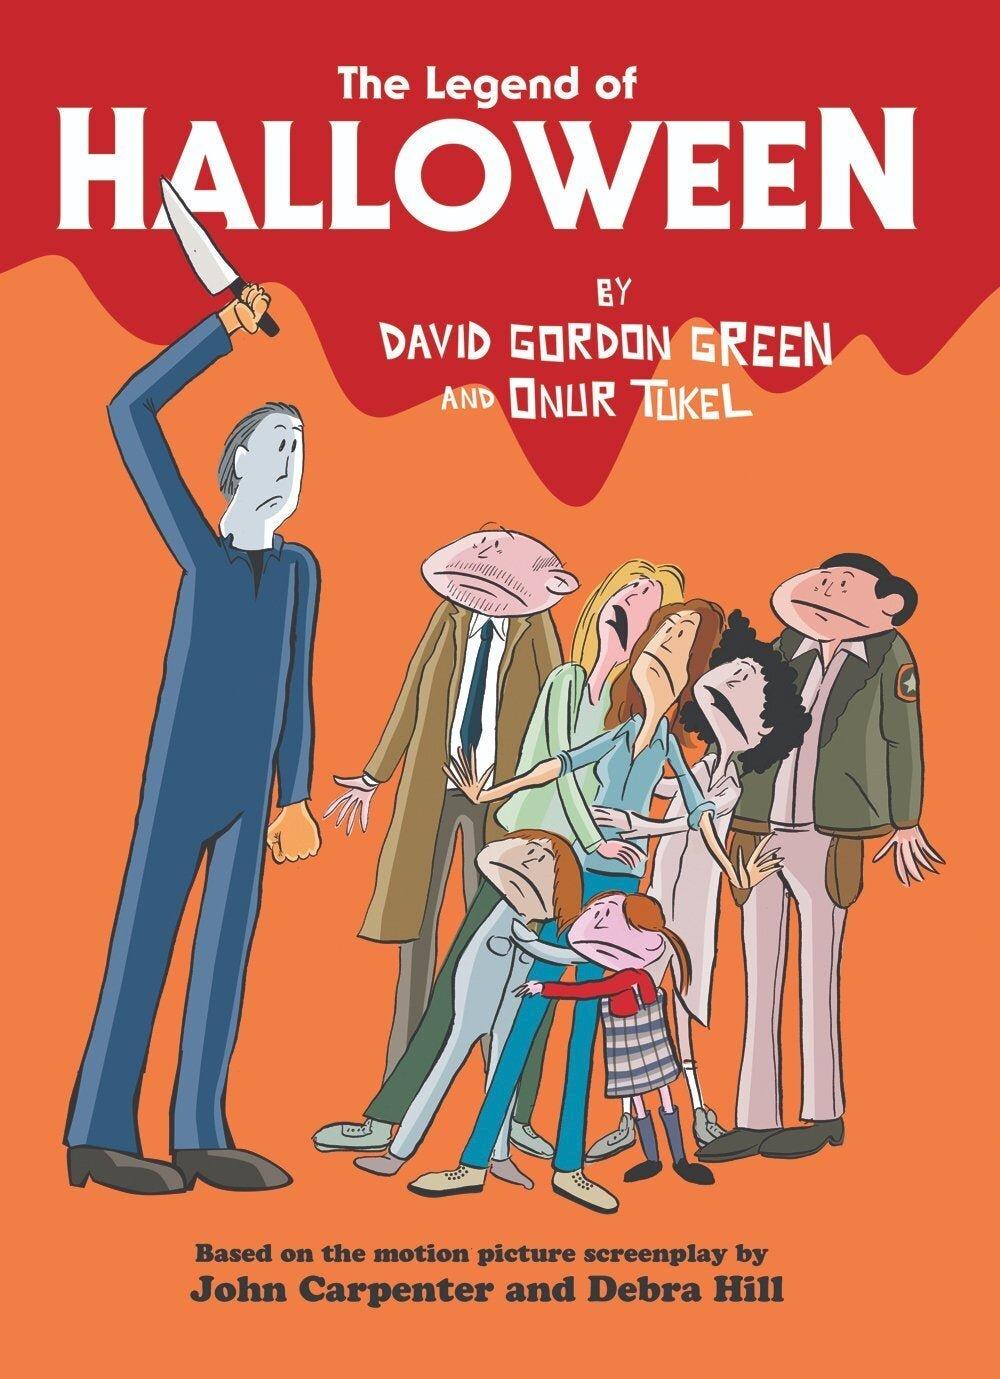 heres-an-illustrated-book-version-of-john-carpenters-halloween-from-david-gordon-green4